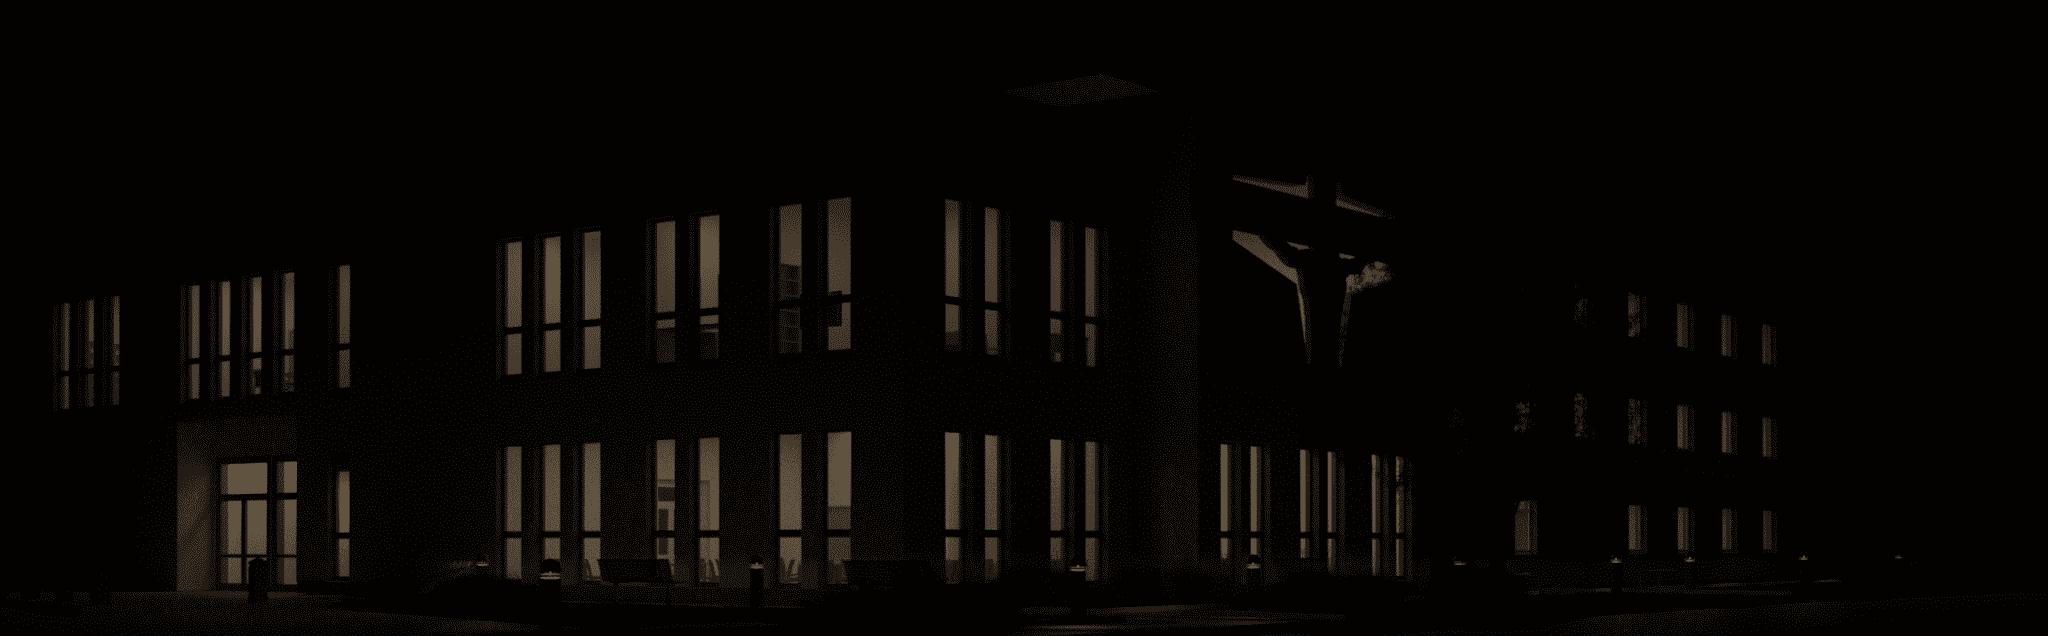 Widok 3D noc